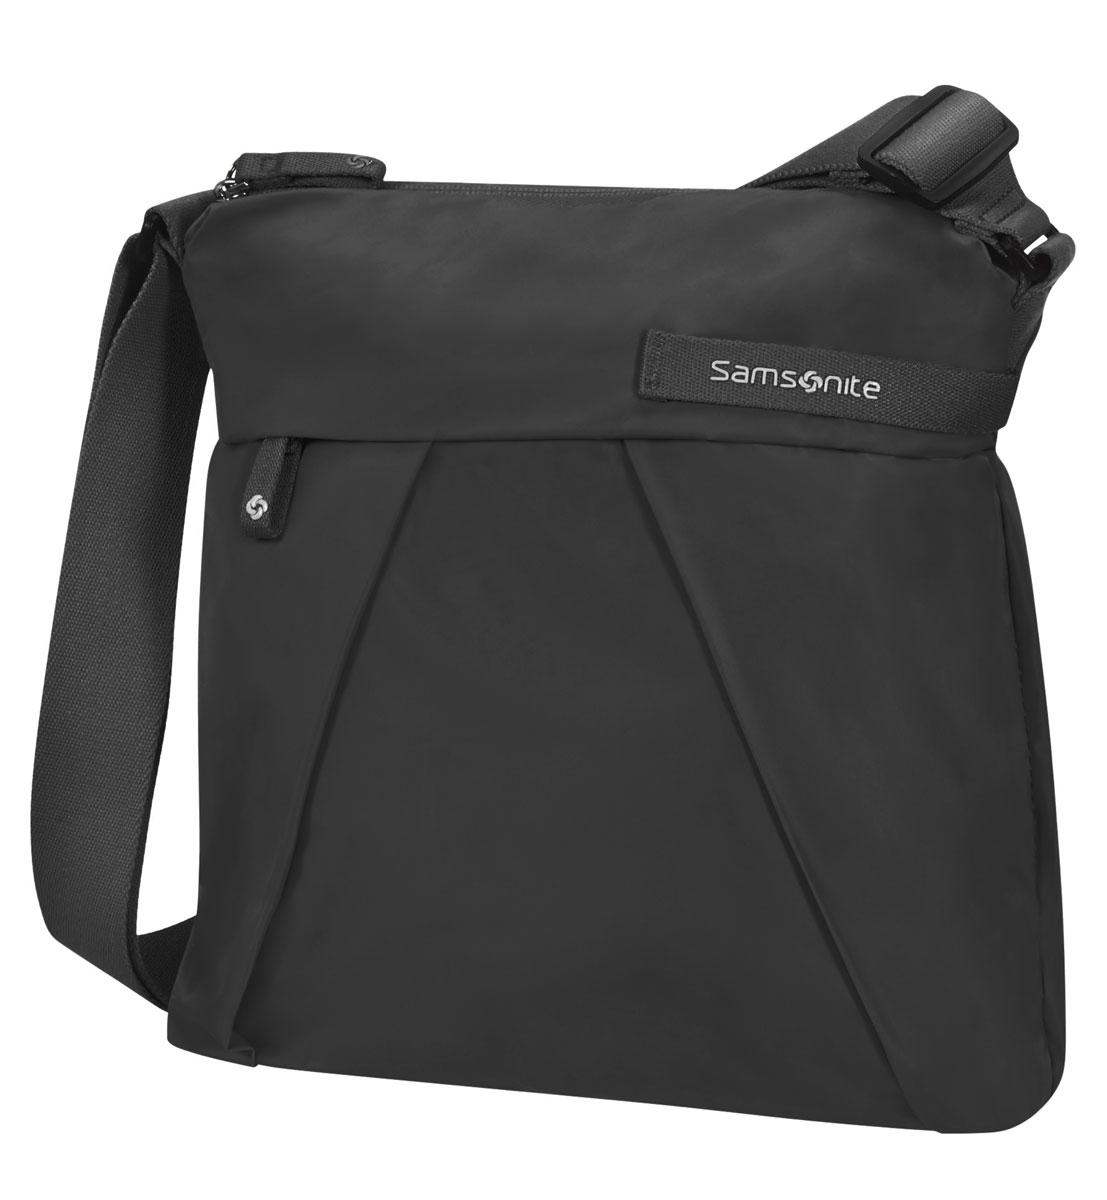 Samsonite Сумка плечевая черный 260*60*30051V-09005